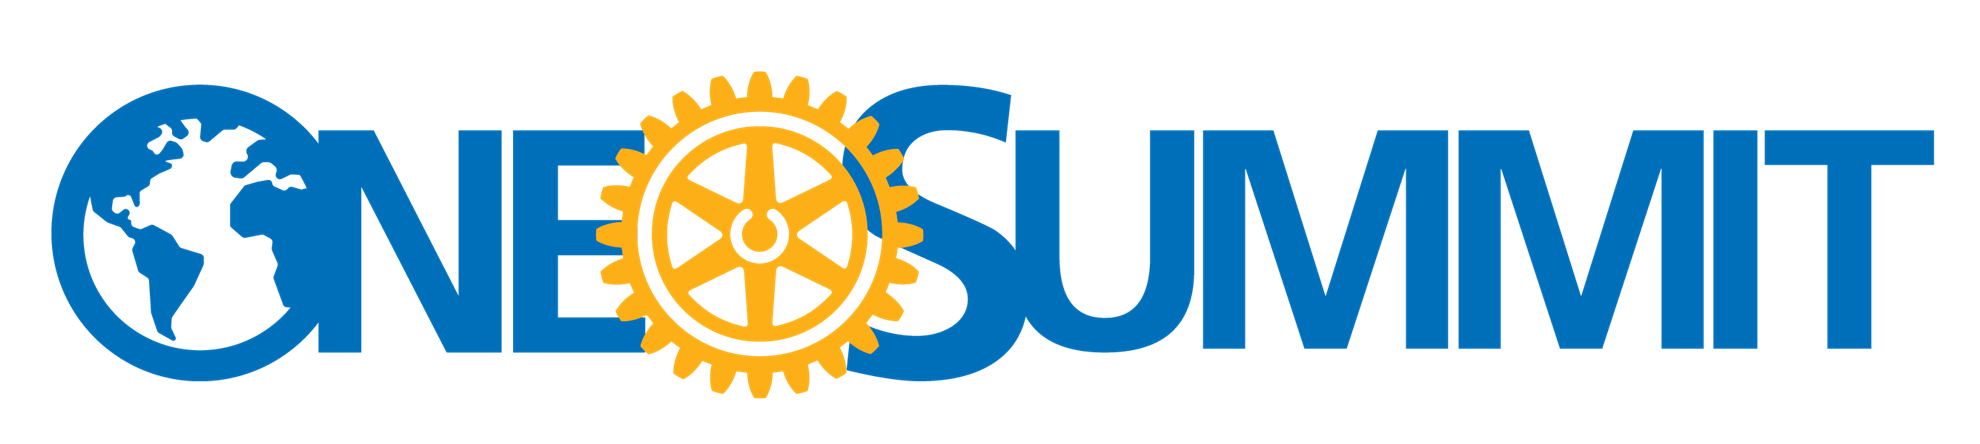 onerotary summit logo